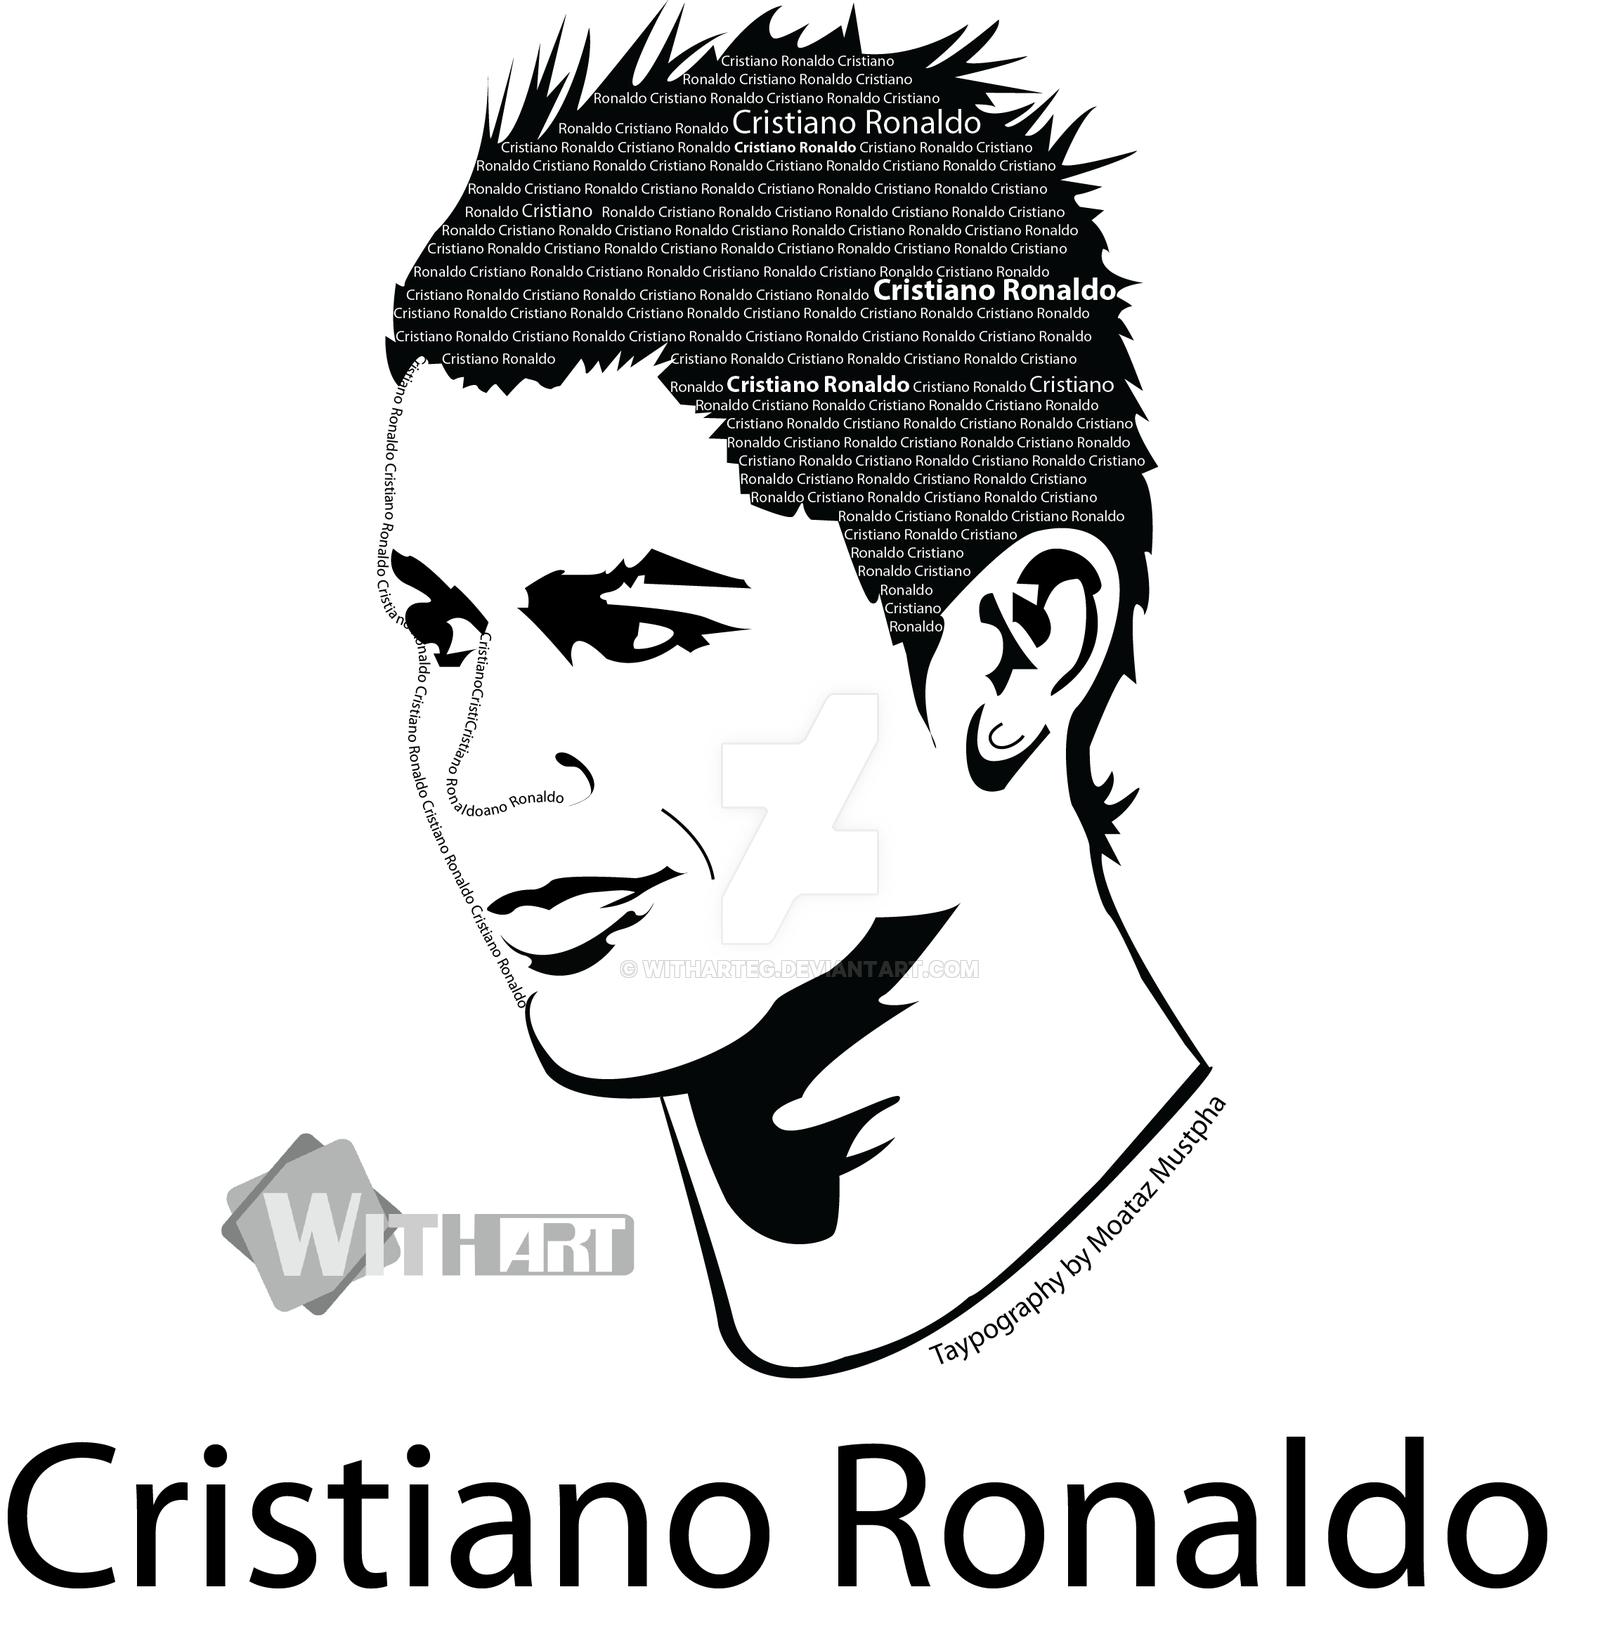 1600x1639 Cristiano Ronaldo By Witharteg